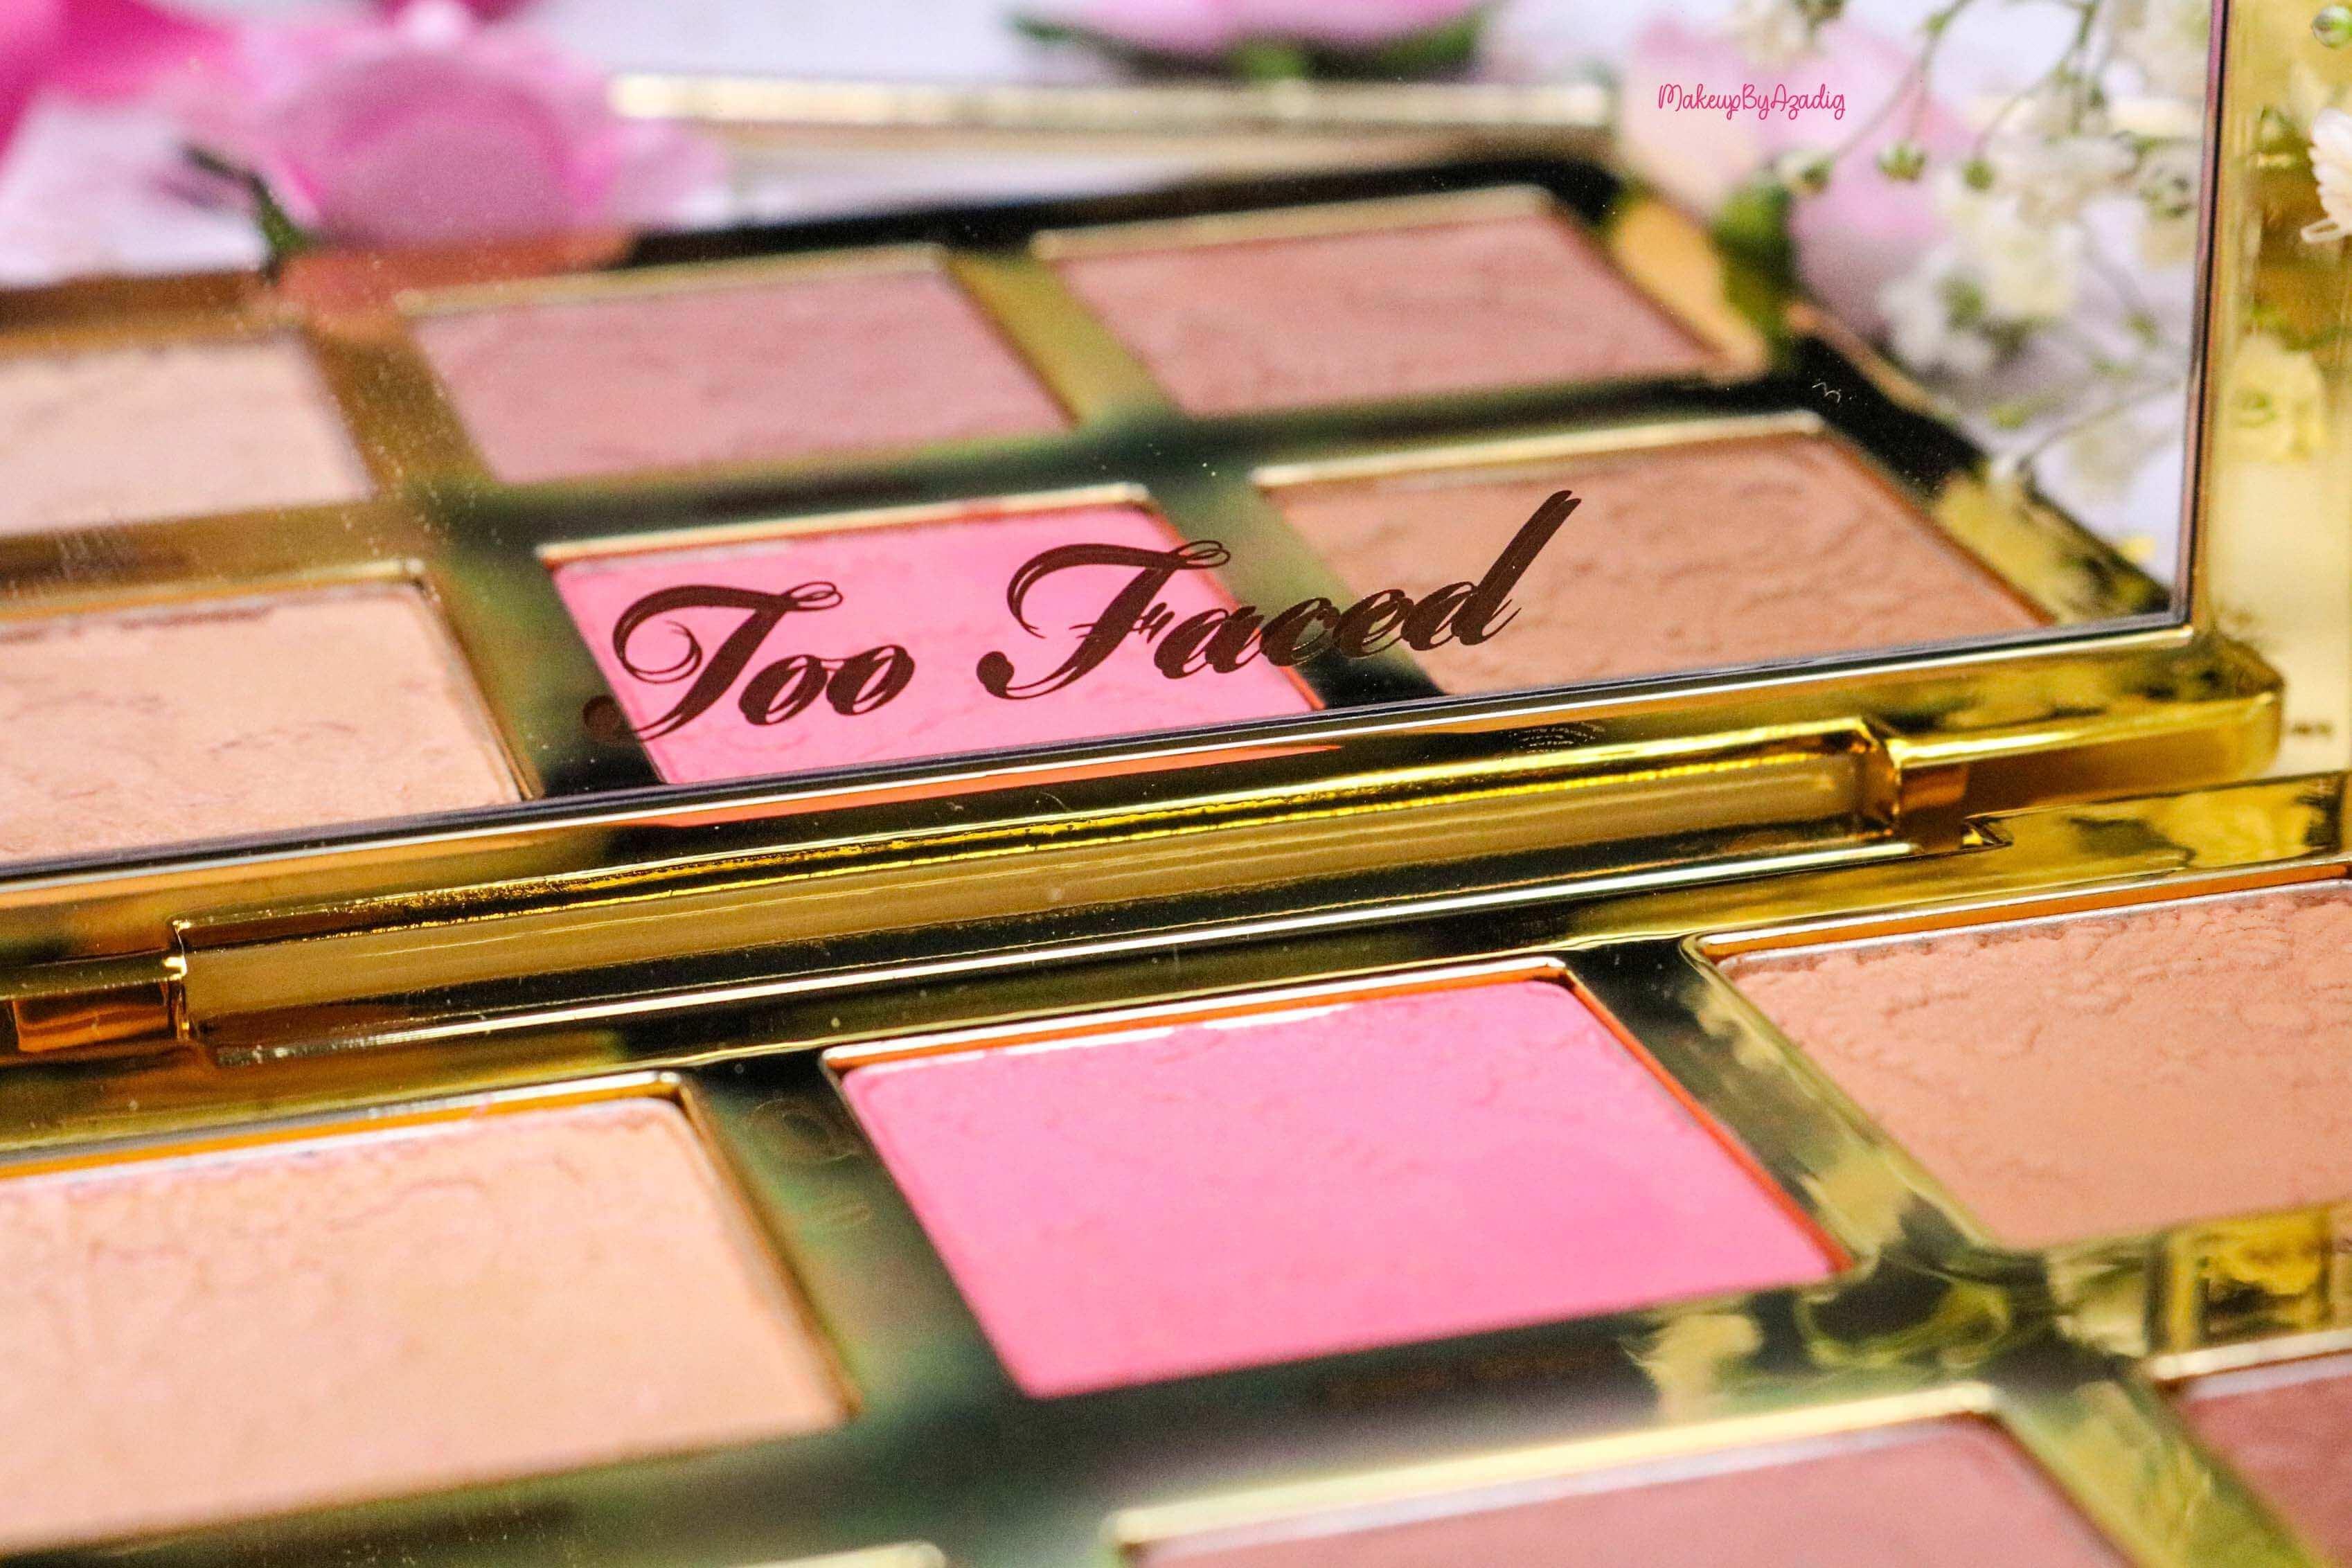 revue-review-palette-teint-natural-face-too-faced-makeupbyazadig-sephora-france-avis-prix-swatch-blush-highlighter-logo